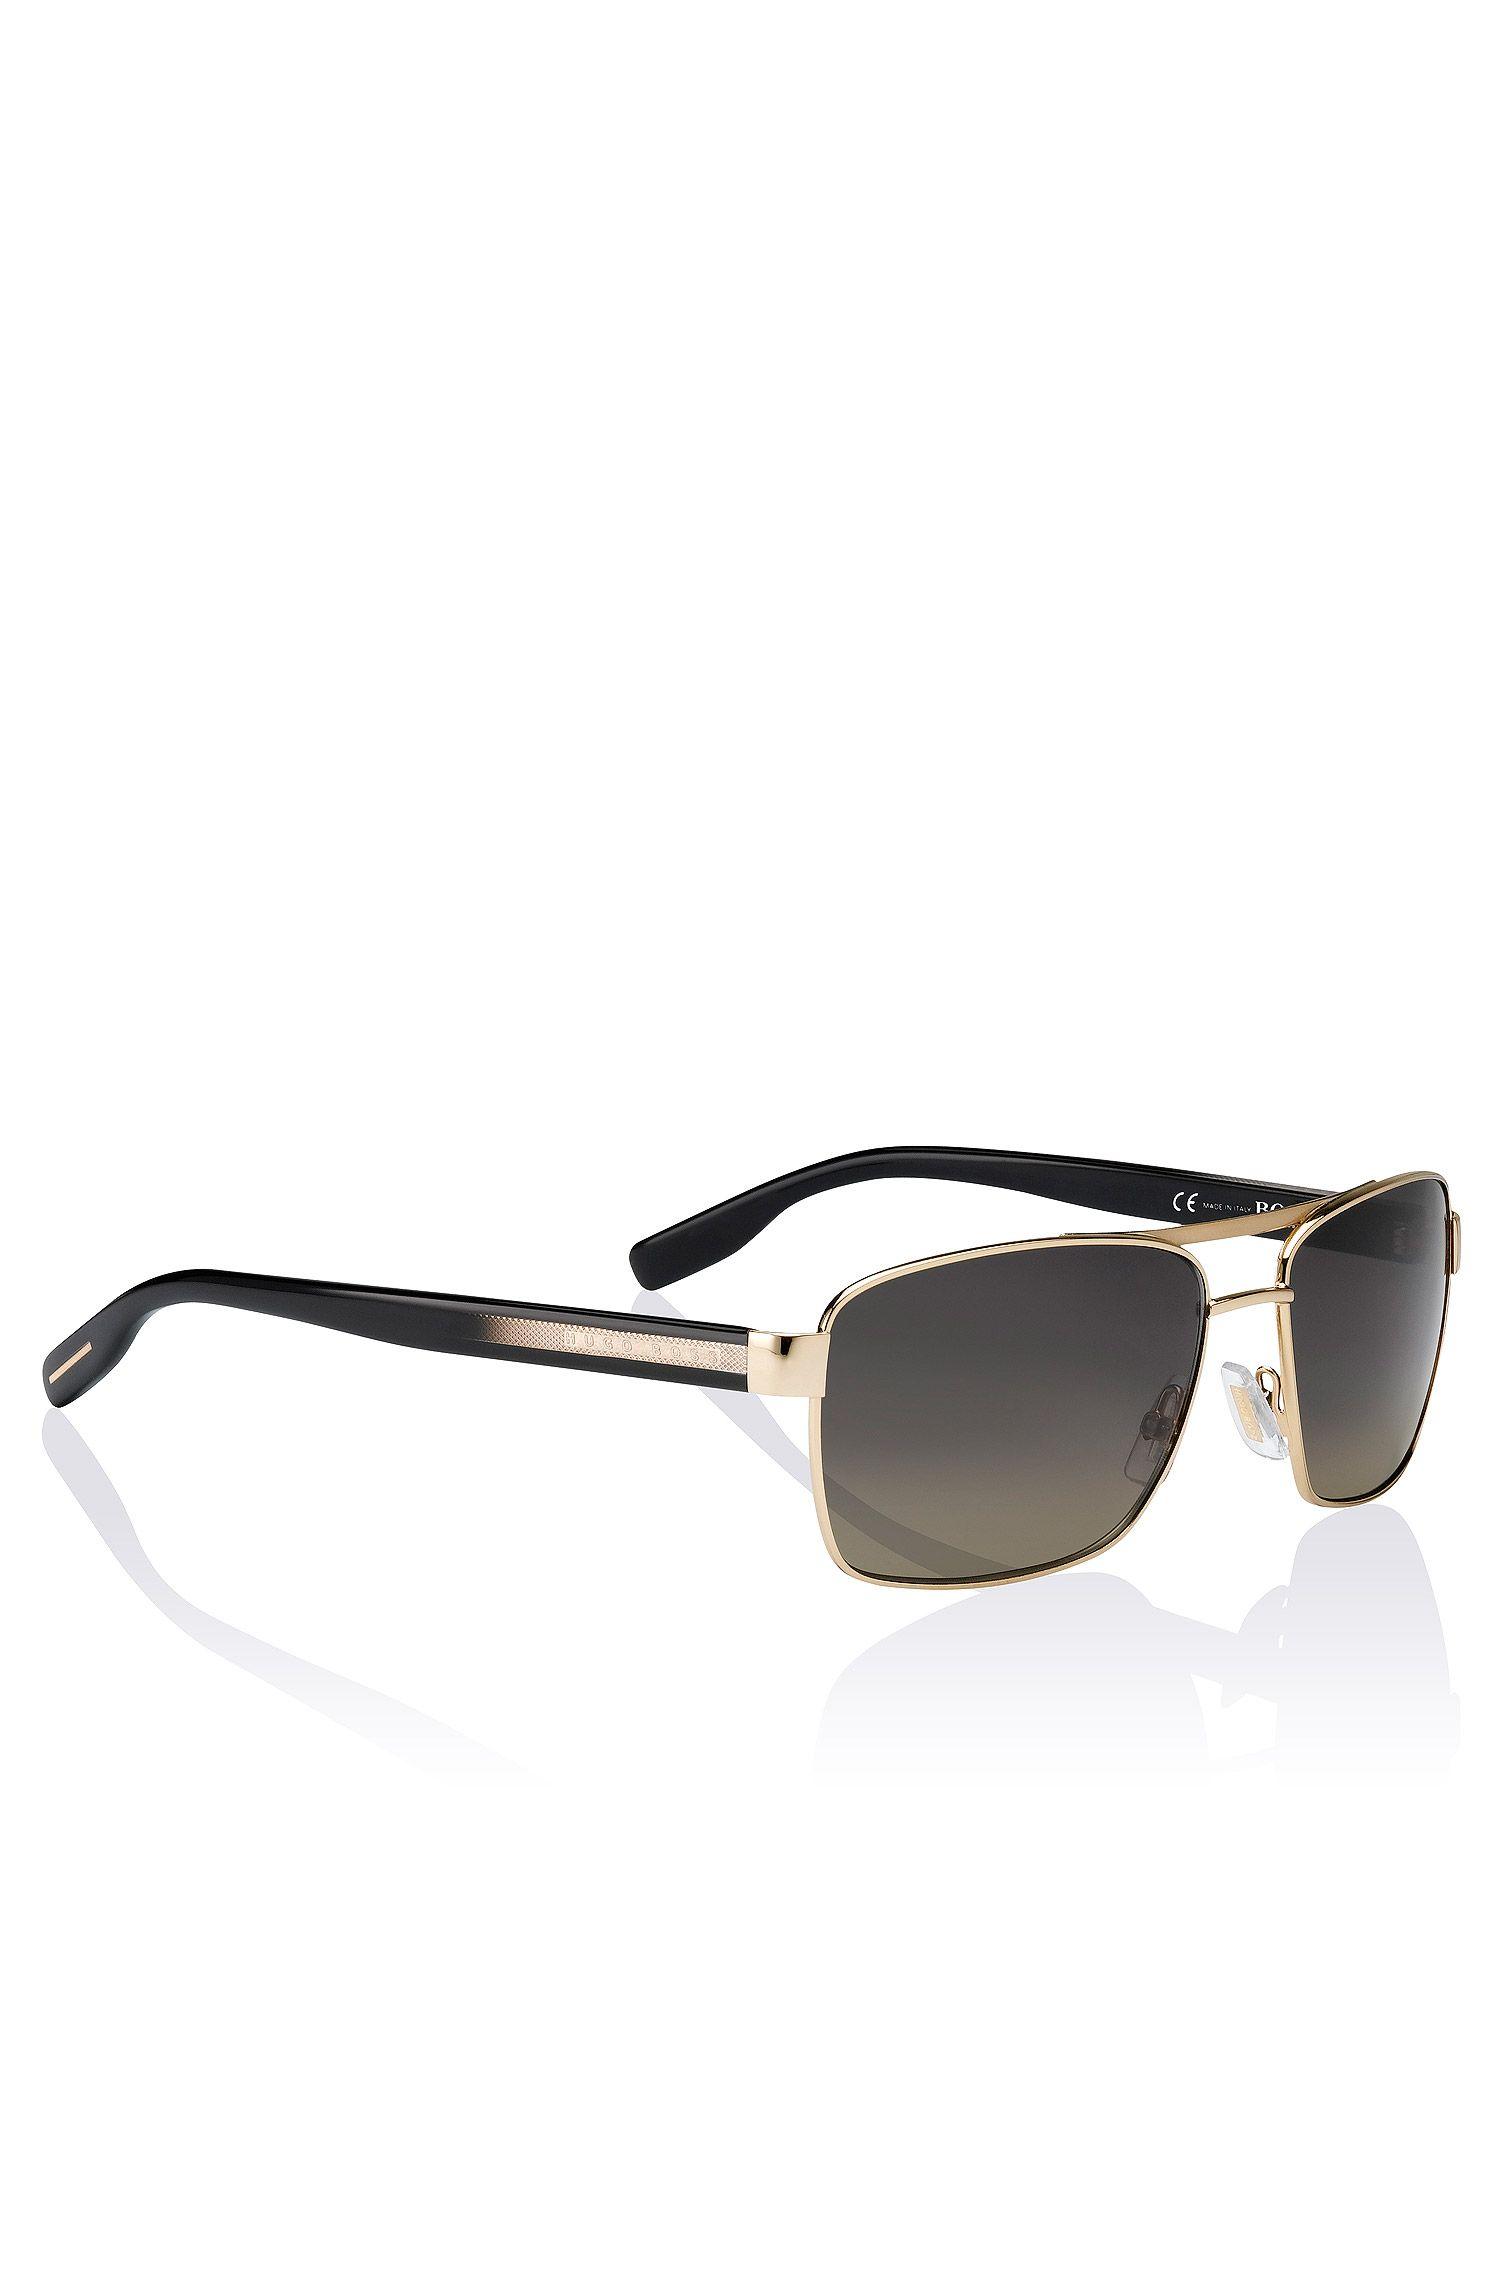 Sonnenbrille ´BOSS 0592/S`